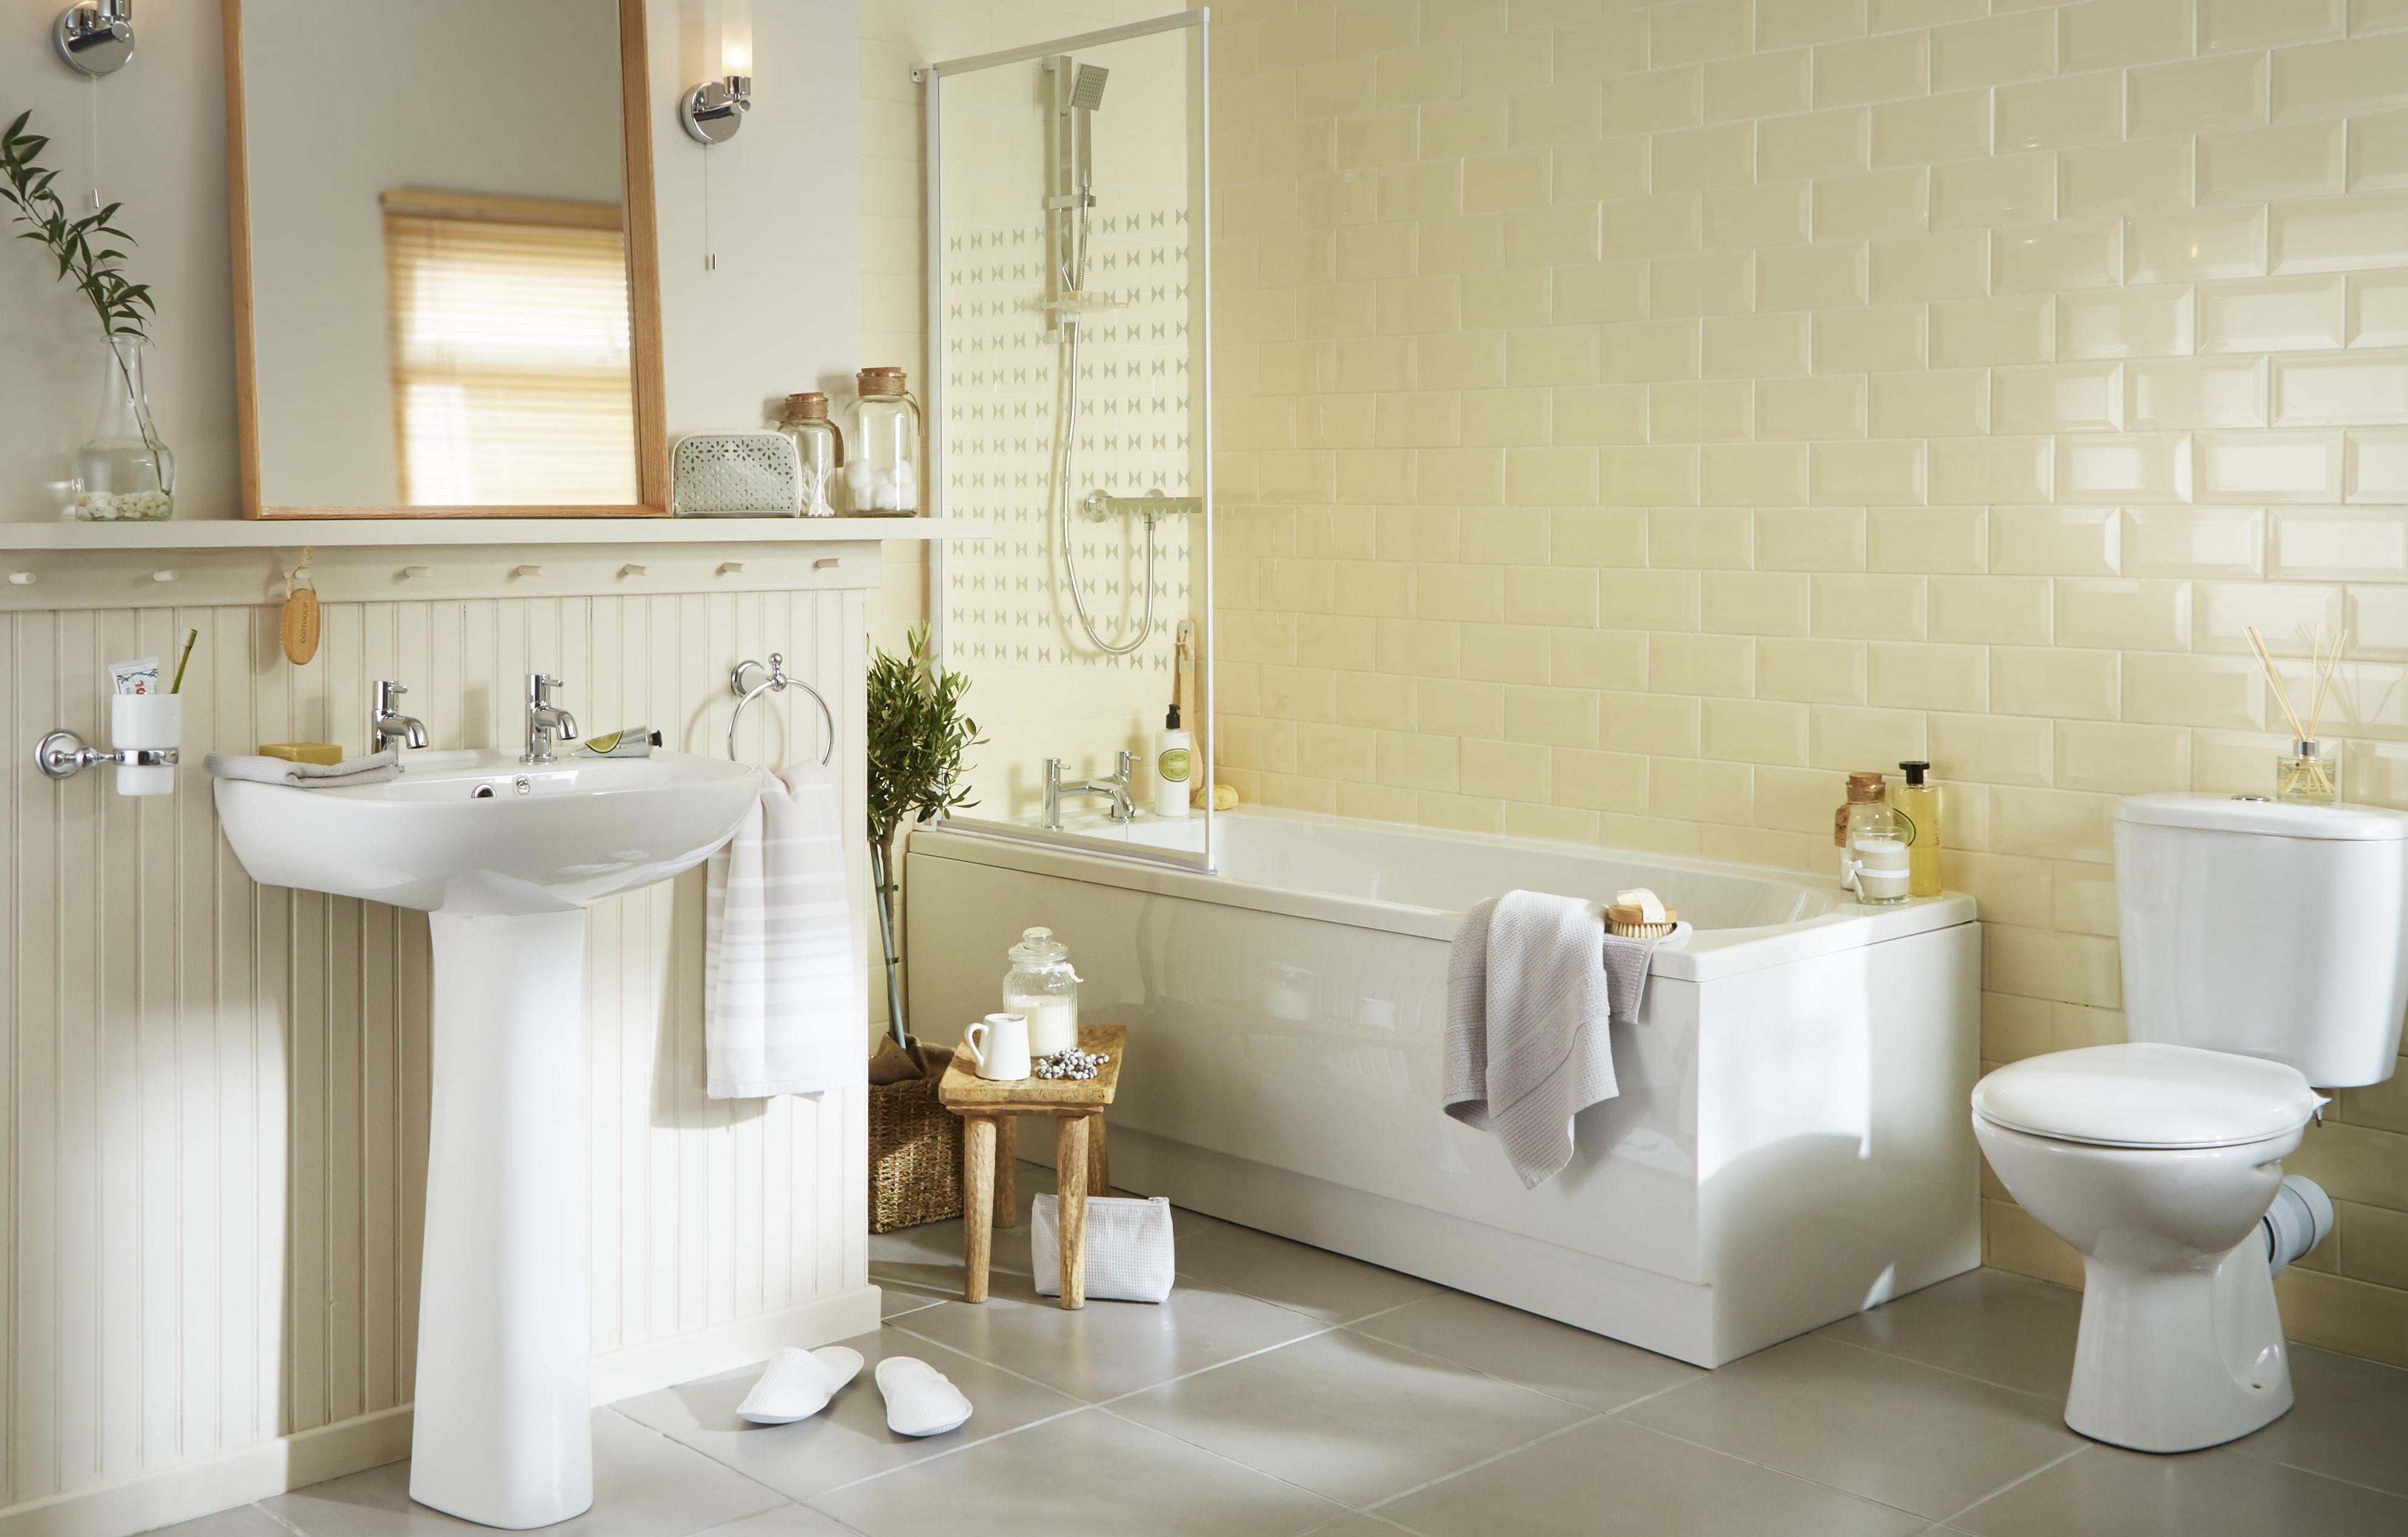 Plumbsure Truro Bathroom Suites